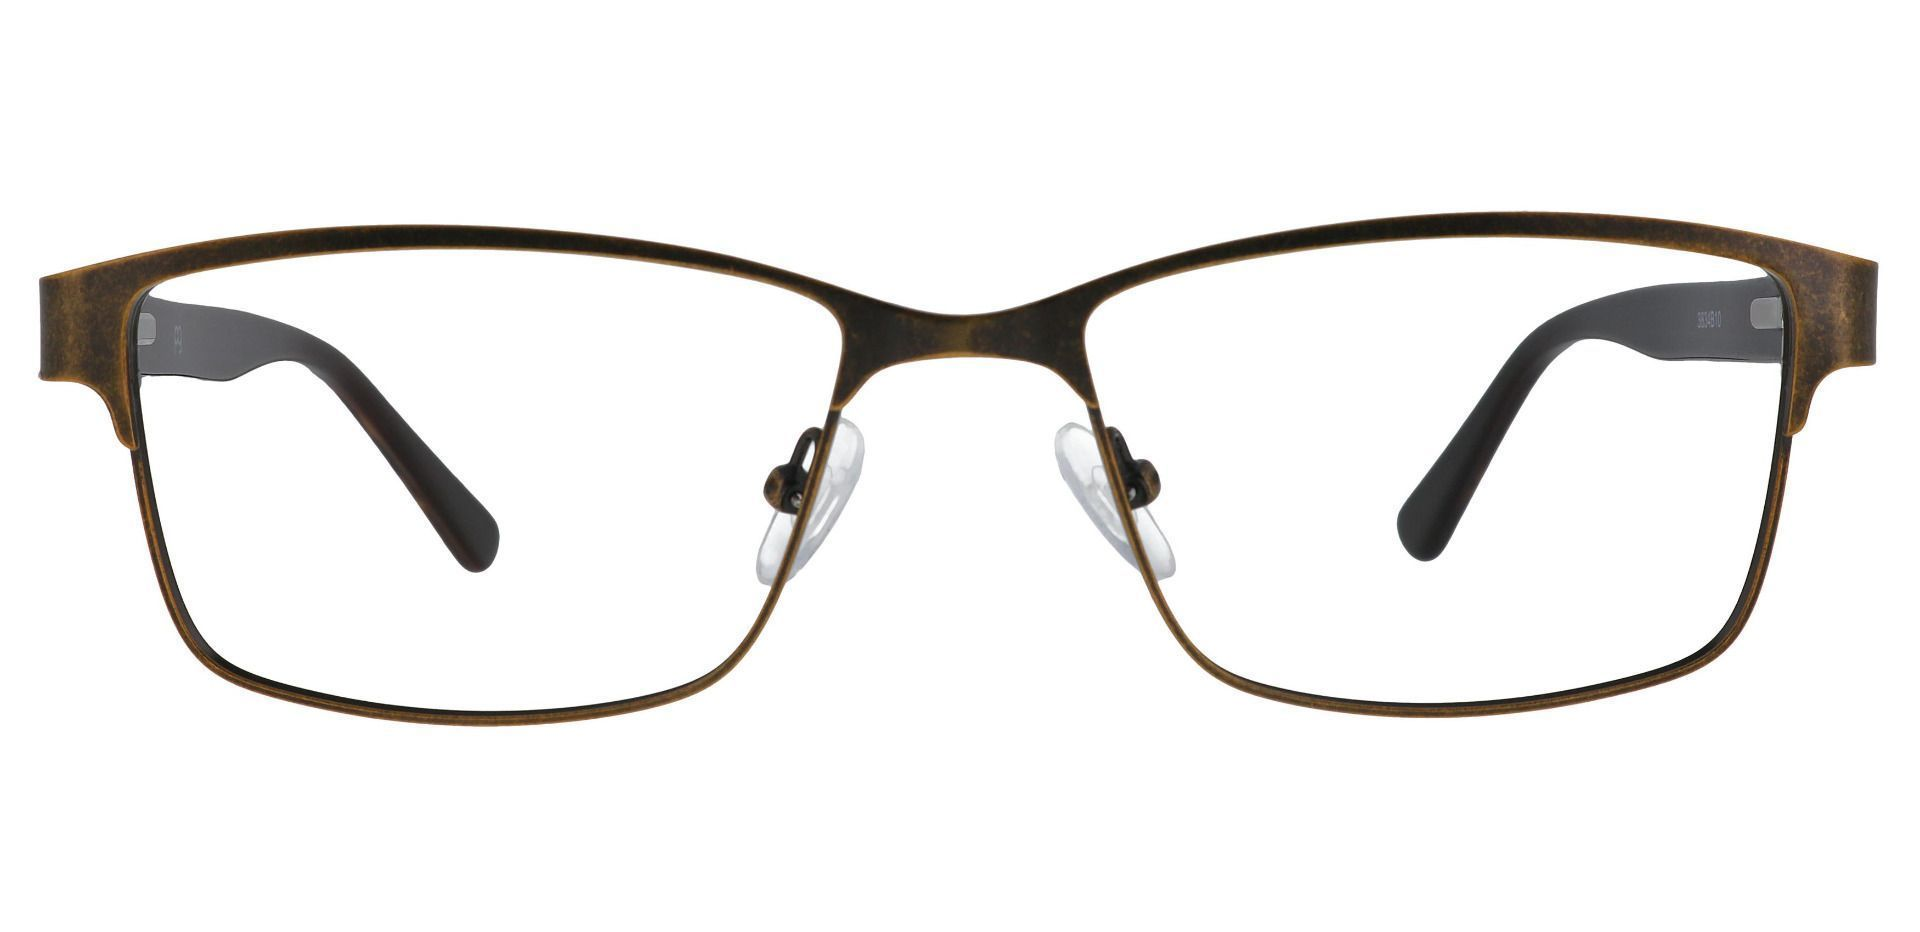 Bishop Rectangle Prescription Glasses - Brown